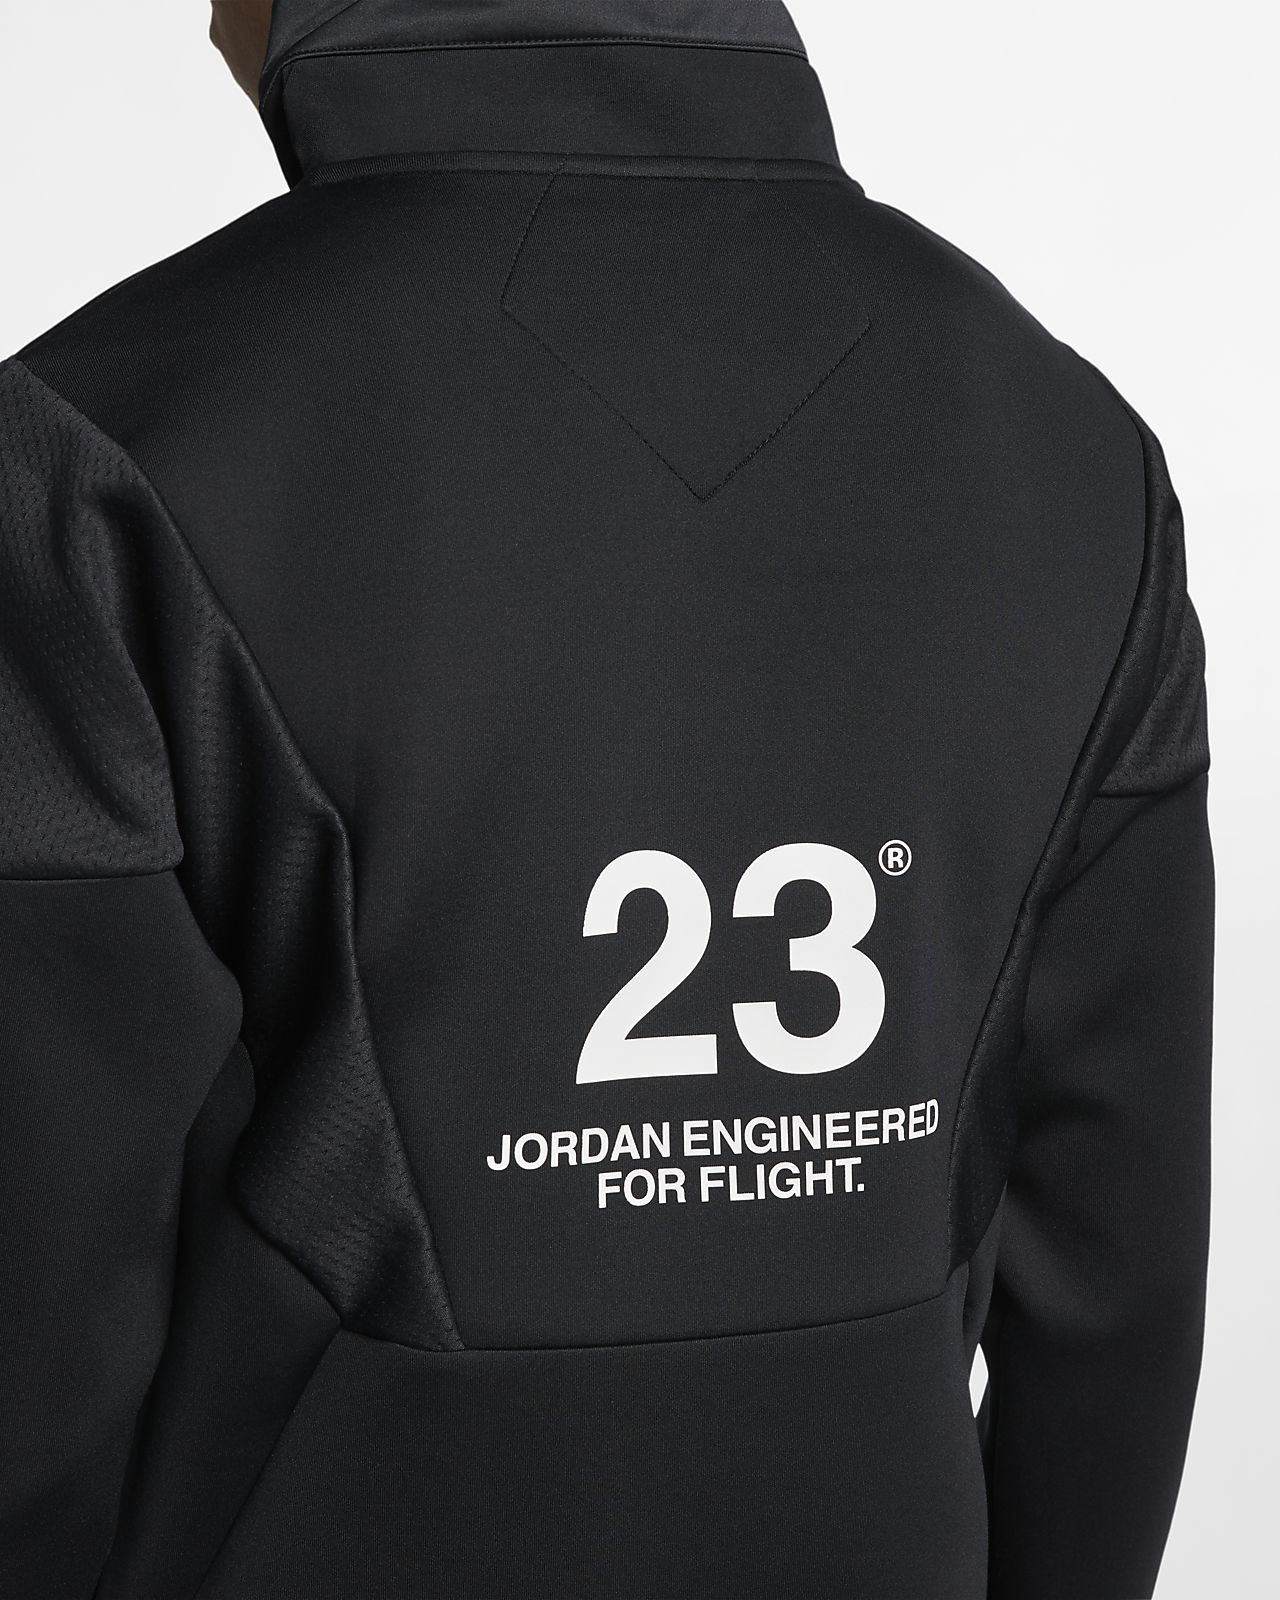 965a4c2cb519 Jordan Flight Tech Lite Men s 1 4-Zip Top. Nike.com GB